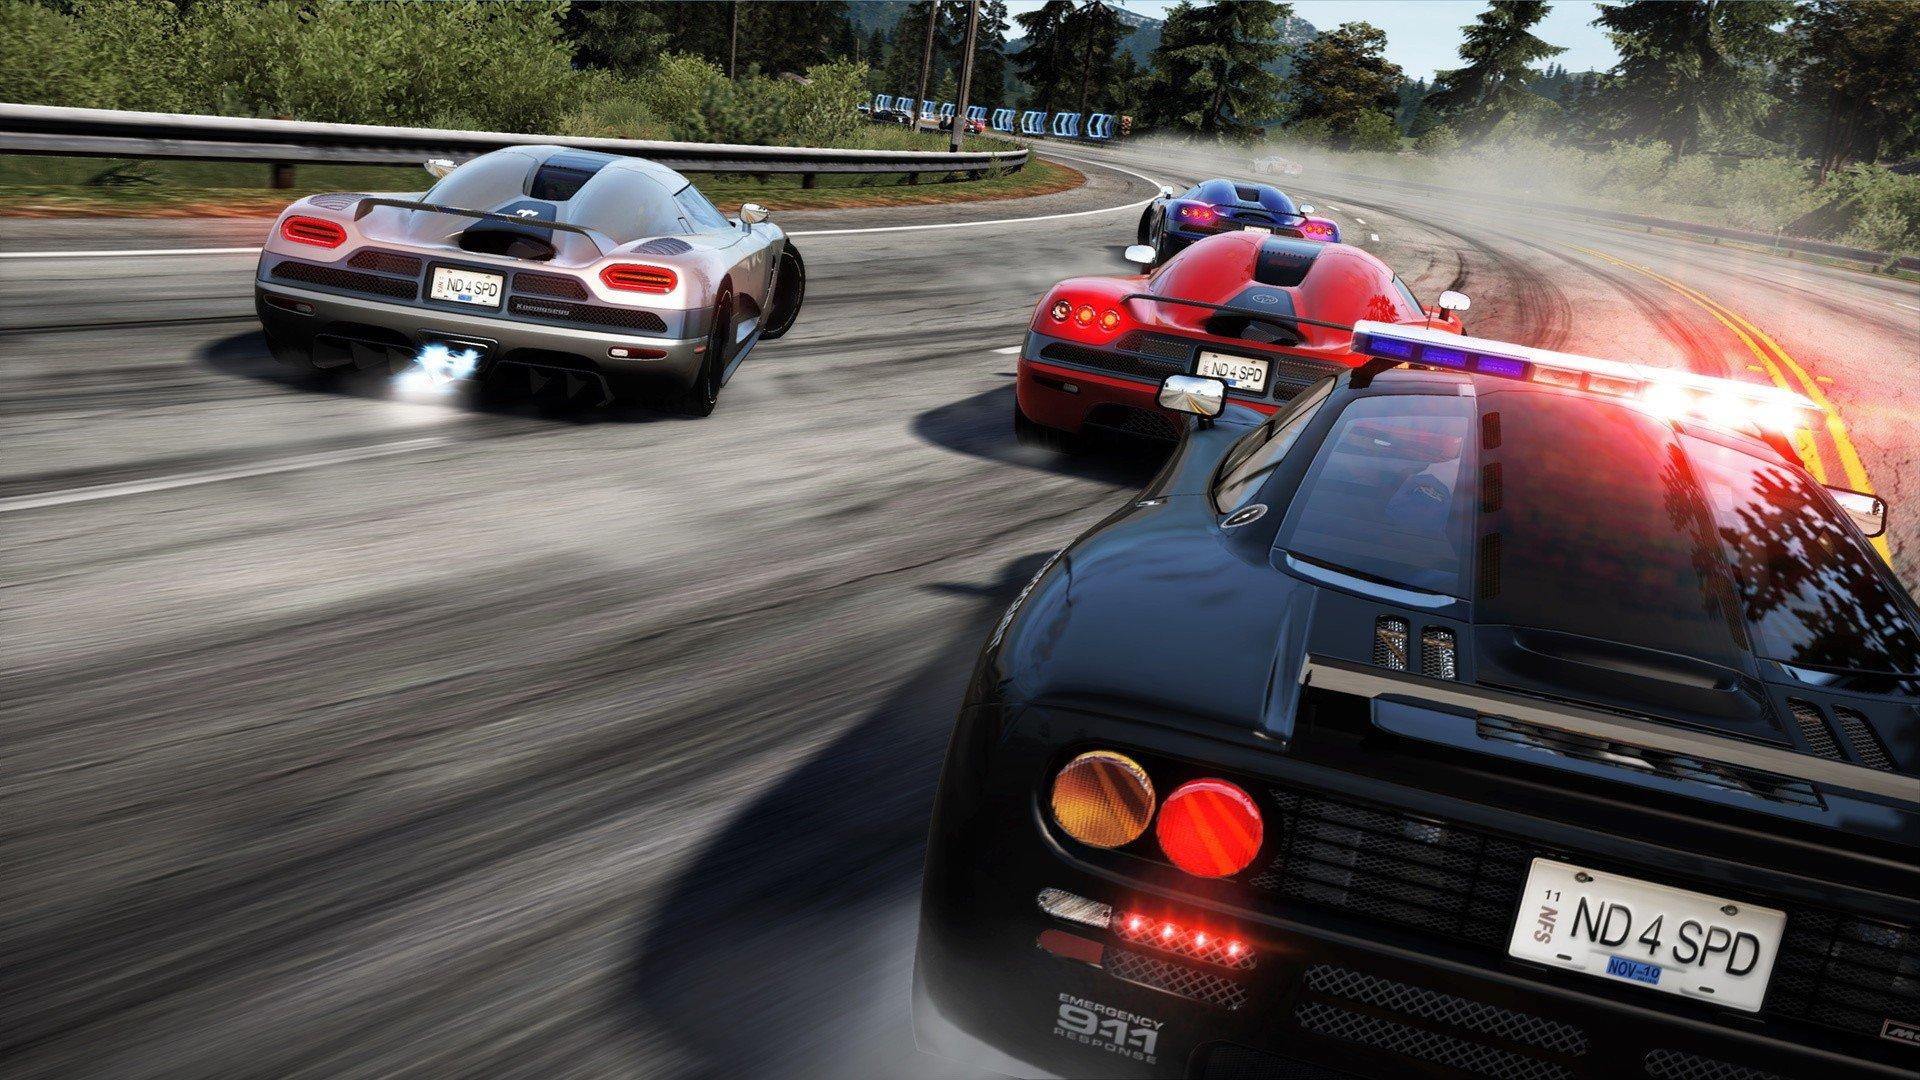 EA SPORTS, Need for Speed, Race cars, Drift Wallpaper